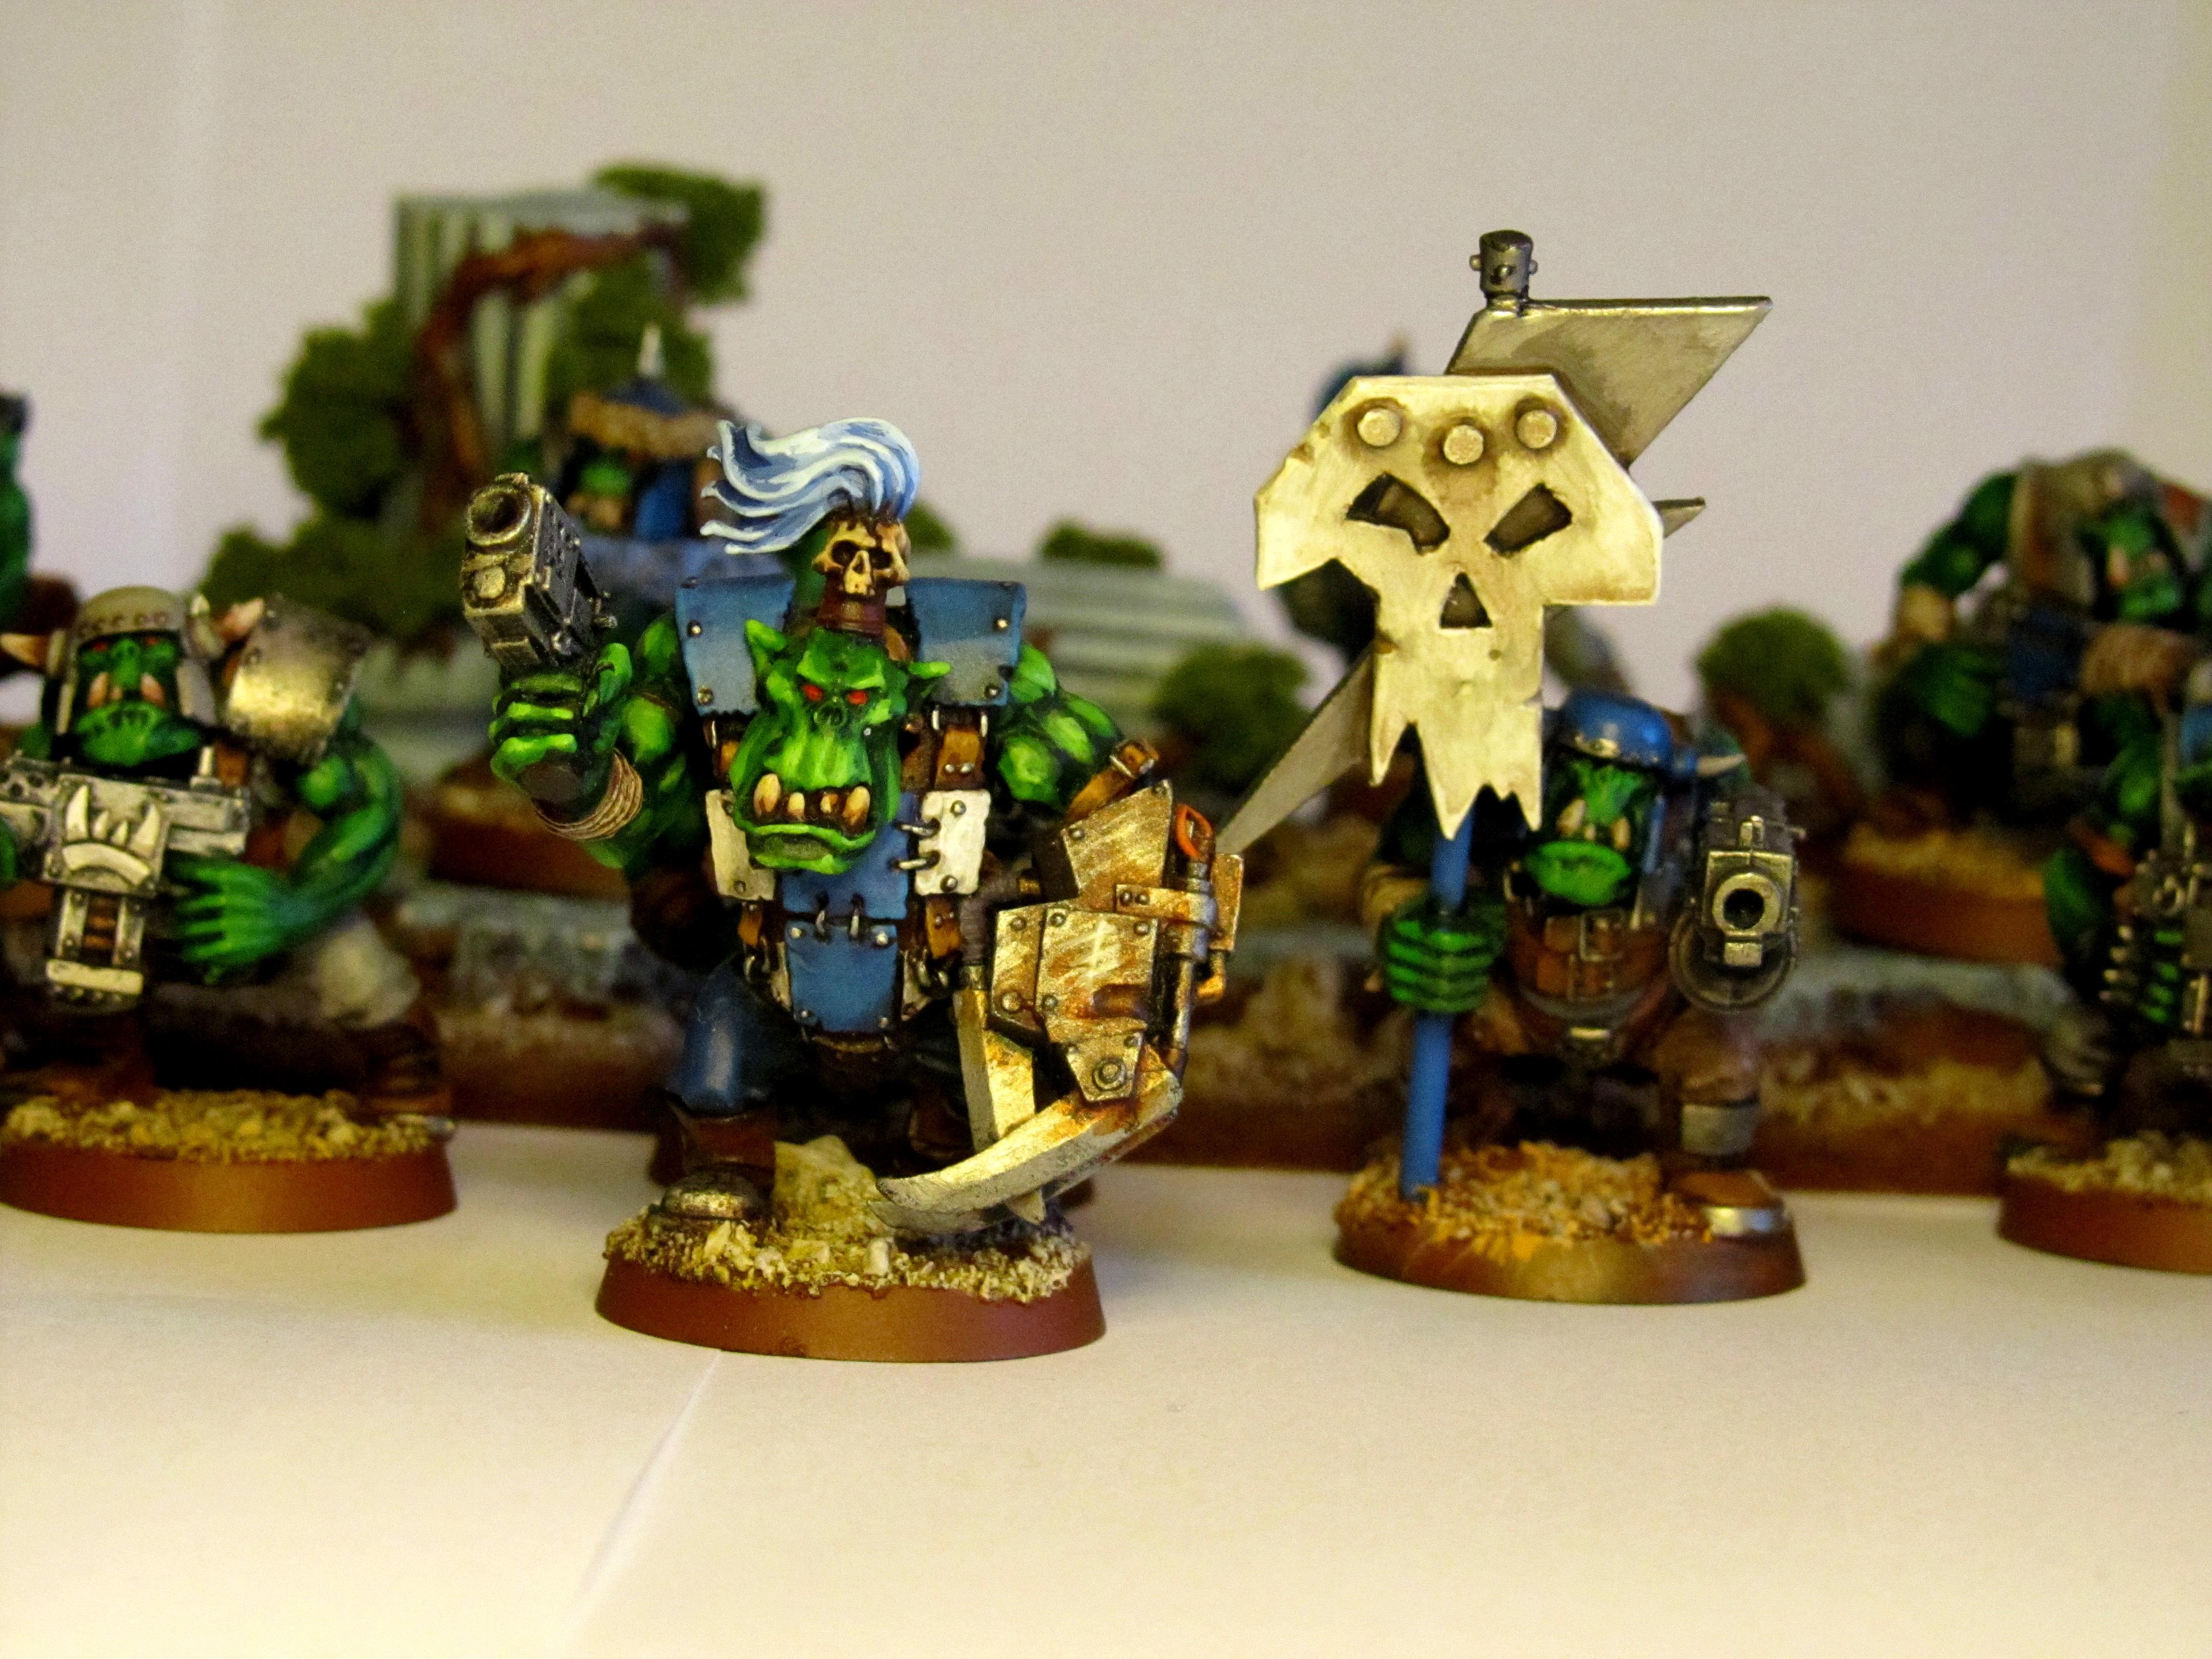 Deathskulls, Nob, Orks, Warhammer 40,000, Warhammer Fantasy